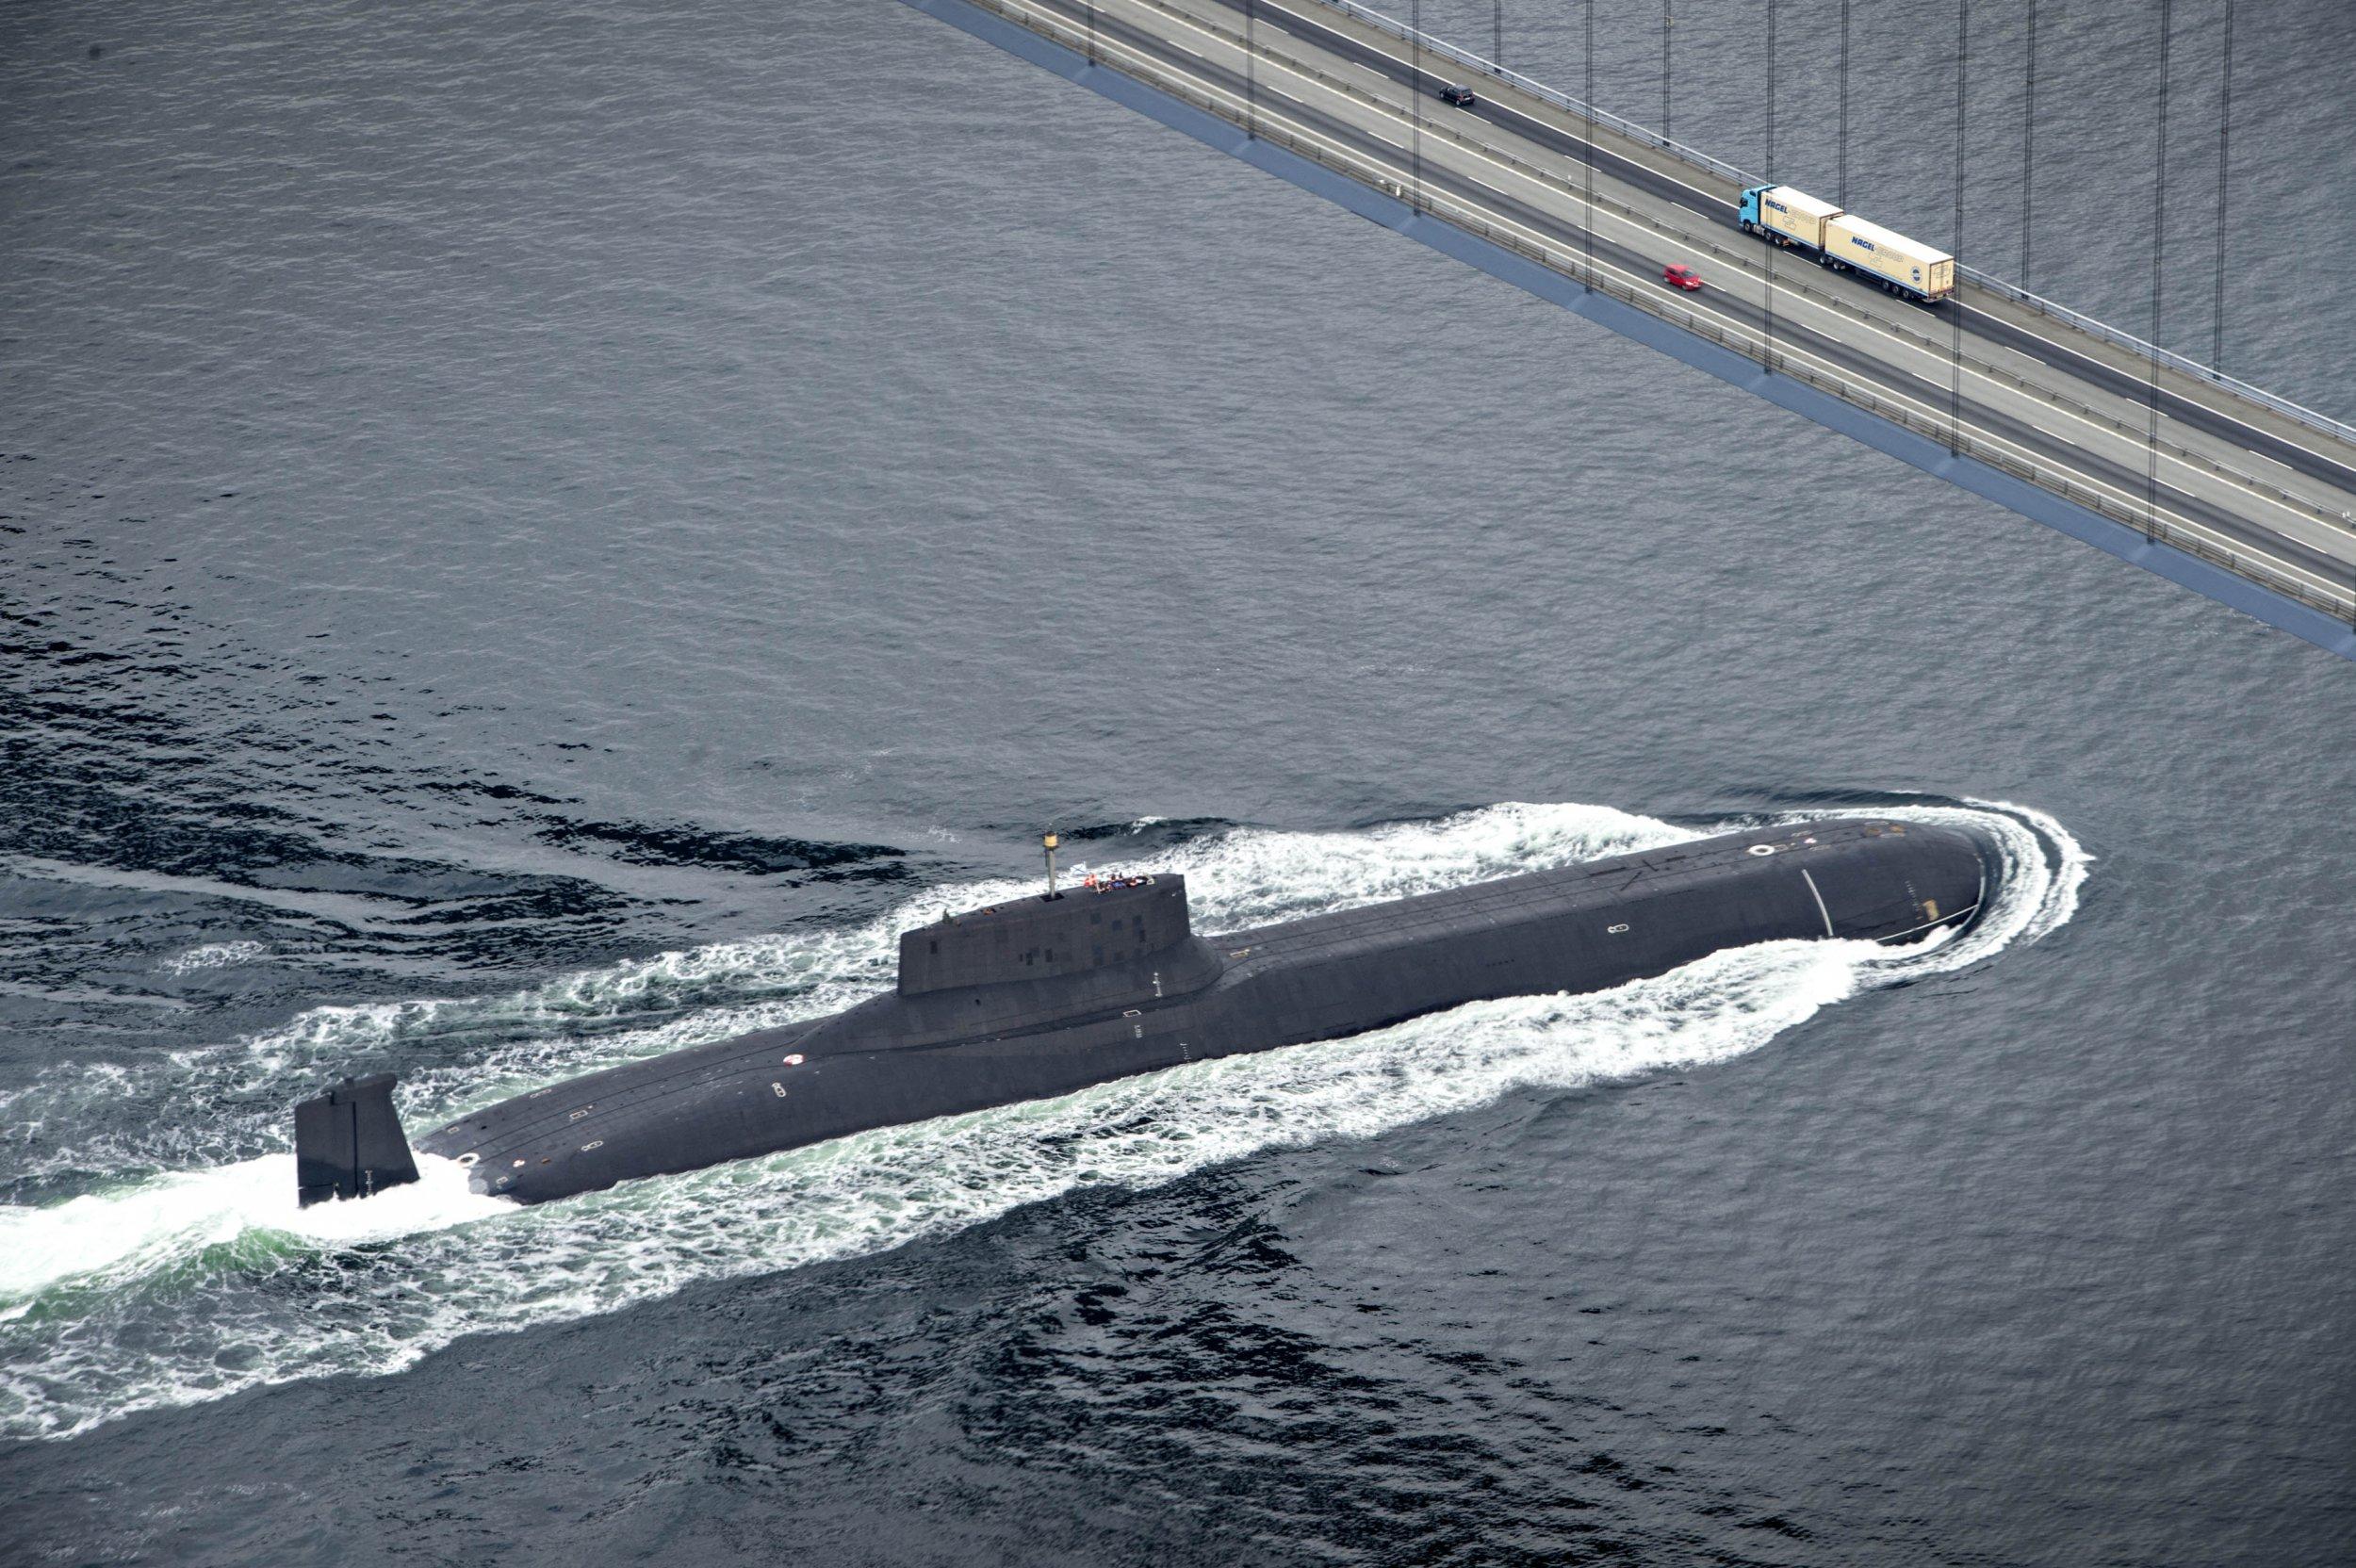 russia submarine activity highest 'since cold war,' nato warns